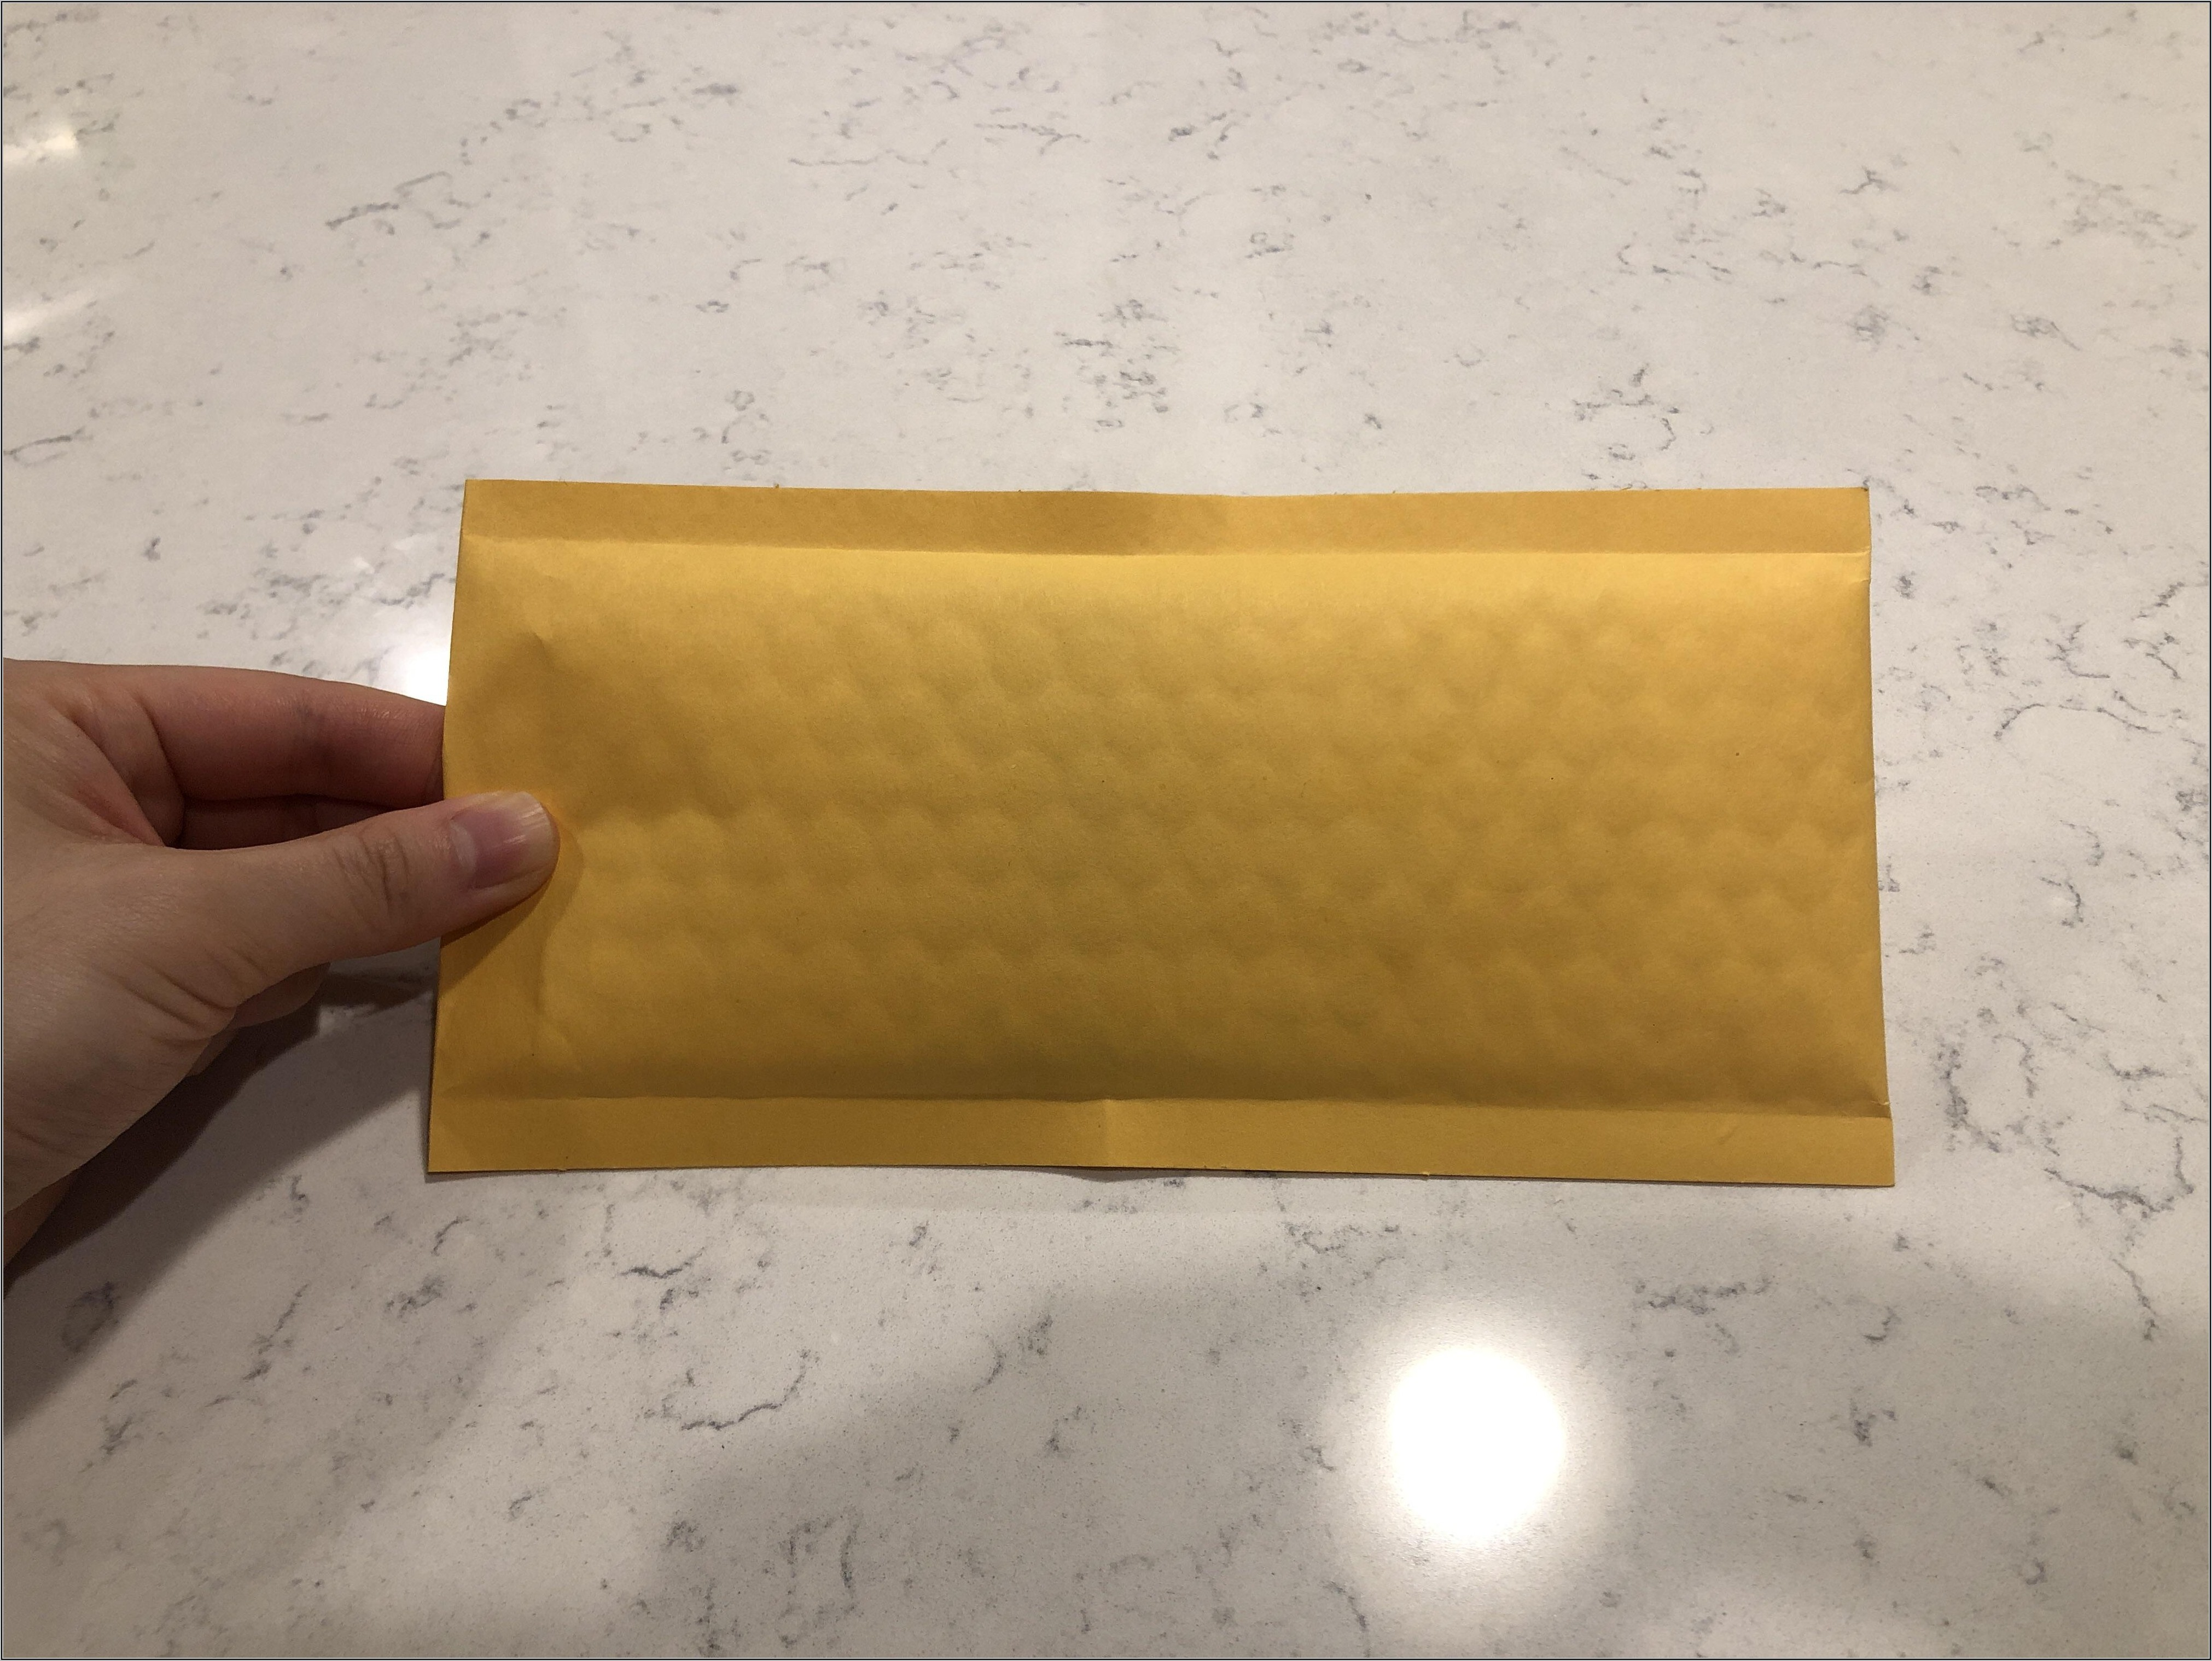 Usps First Class Bubble Envelope